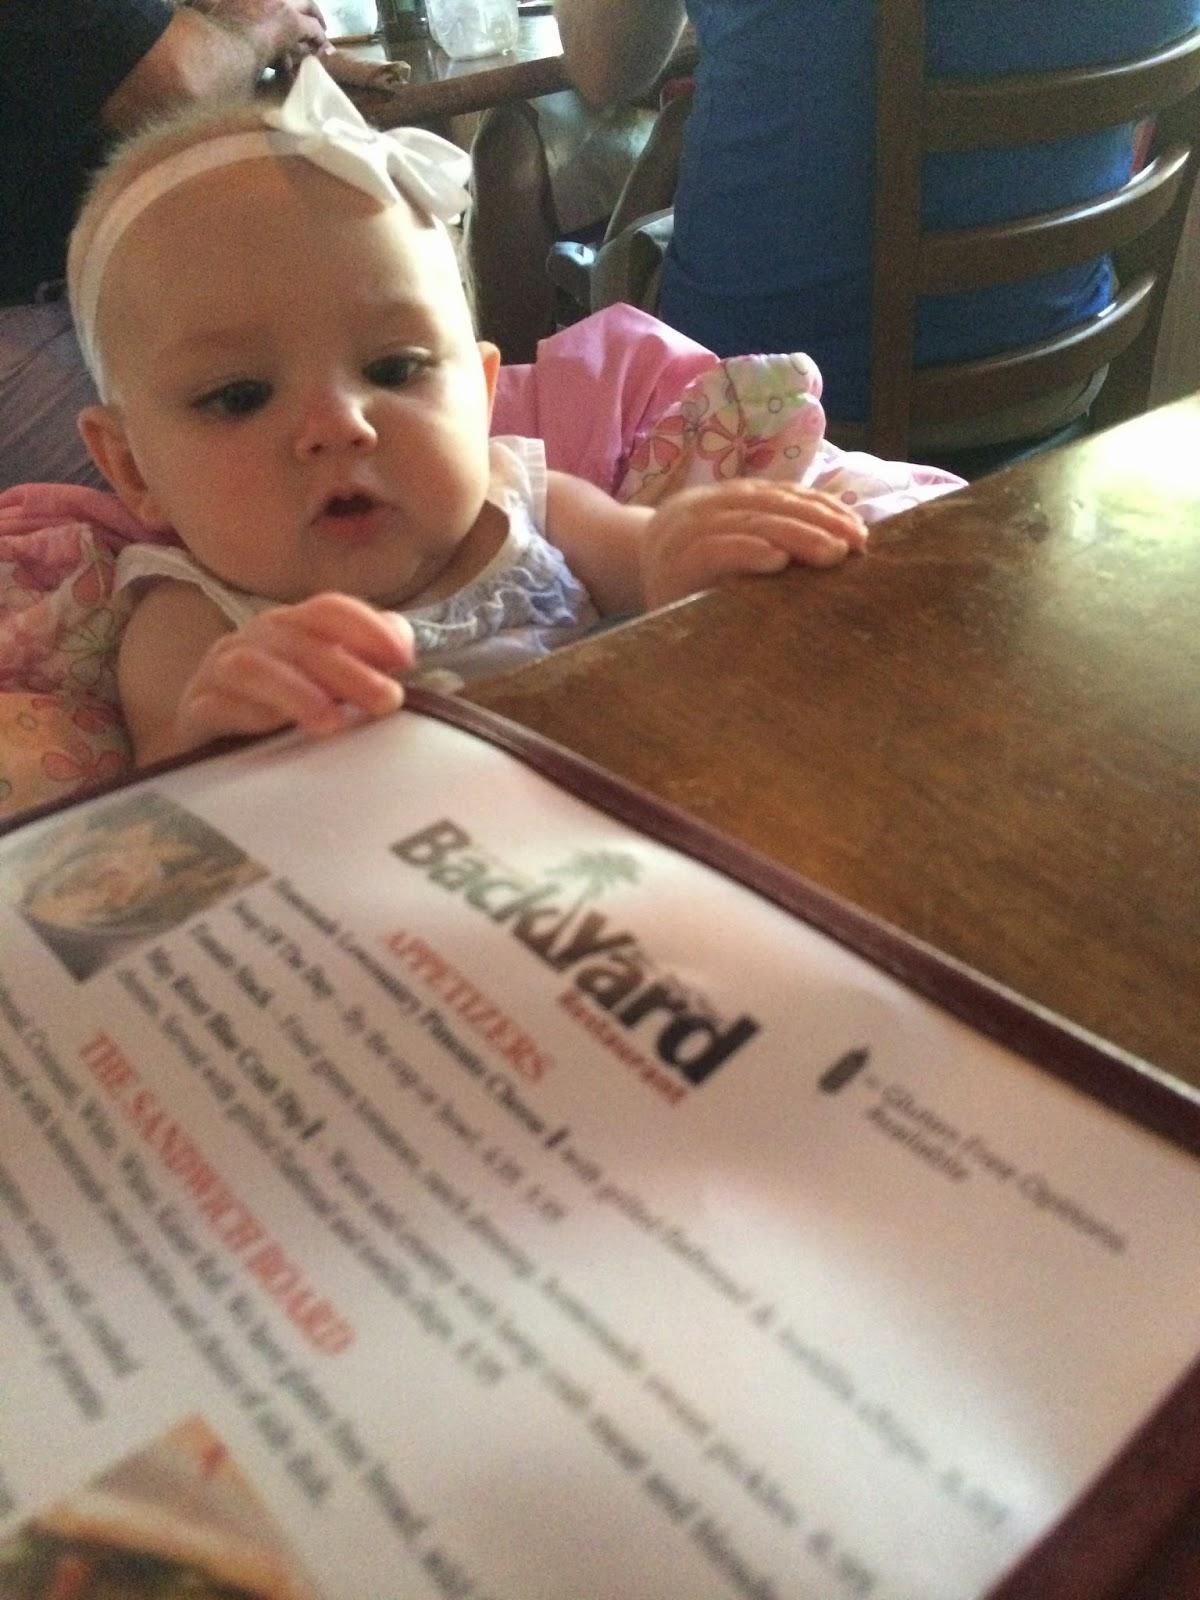 ferg family adventures hilton head 2014